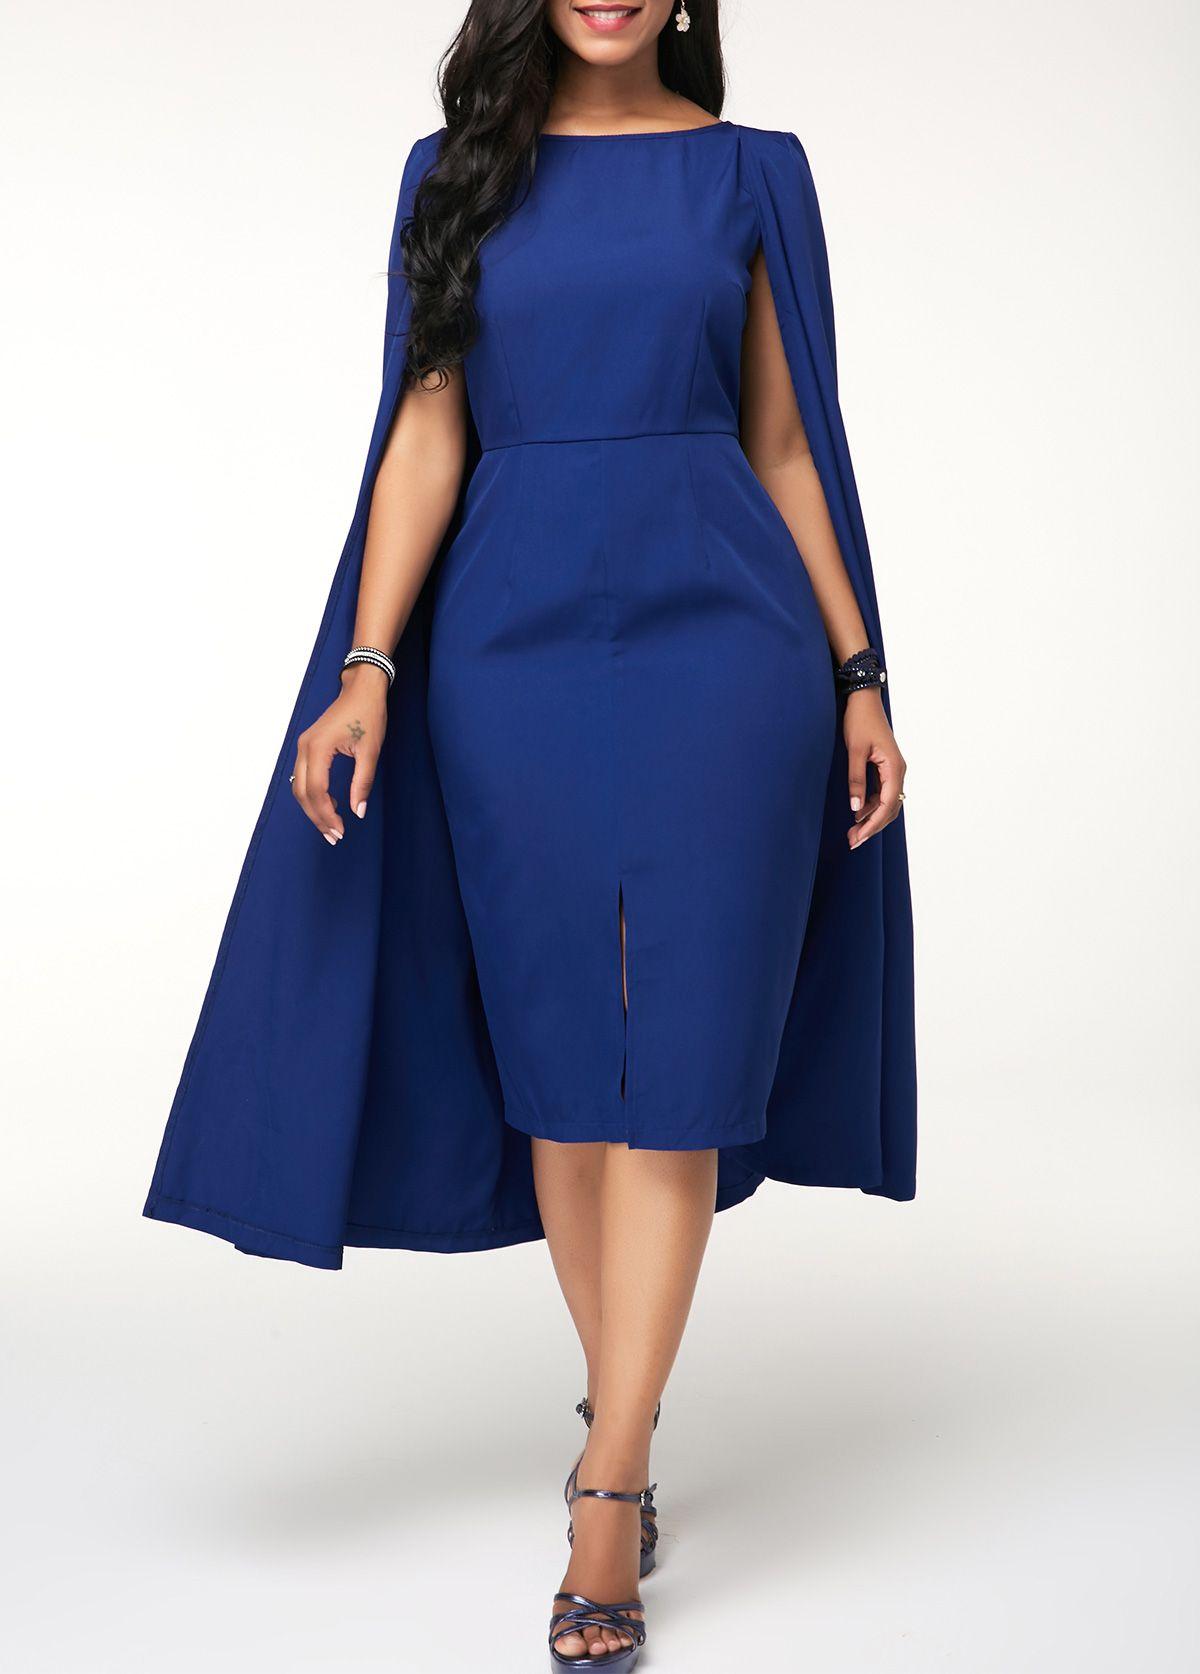 009b8e6a5c Cape Sleeve Front Slit Navy Blue Sheath Dress